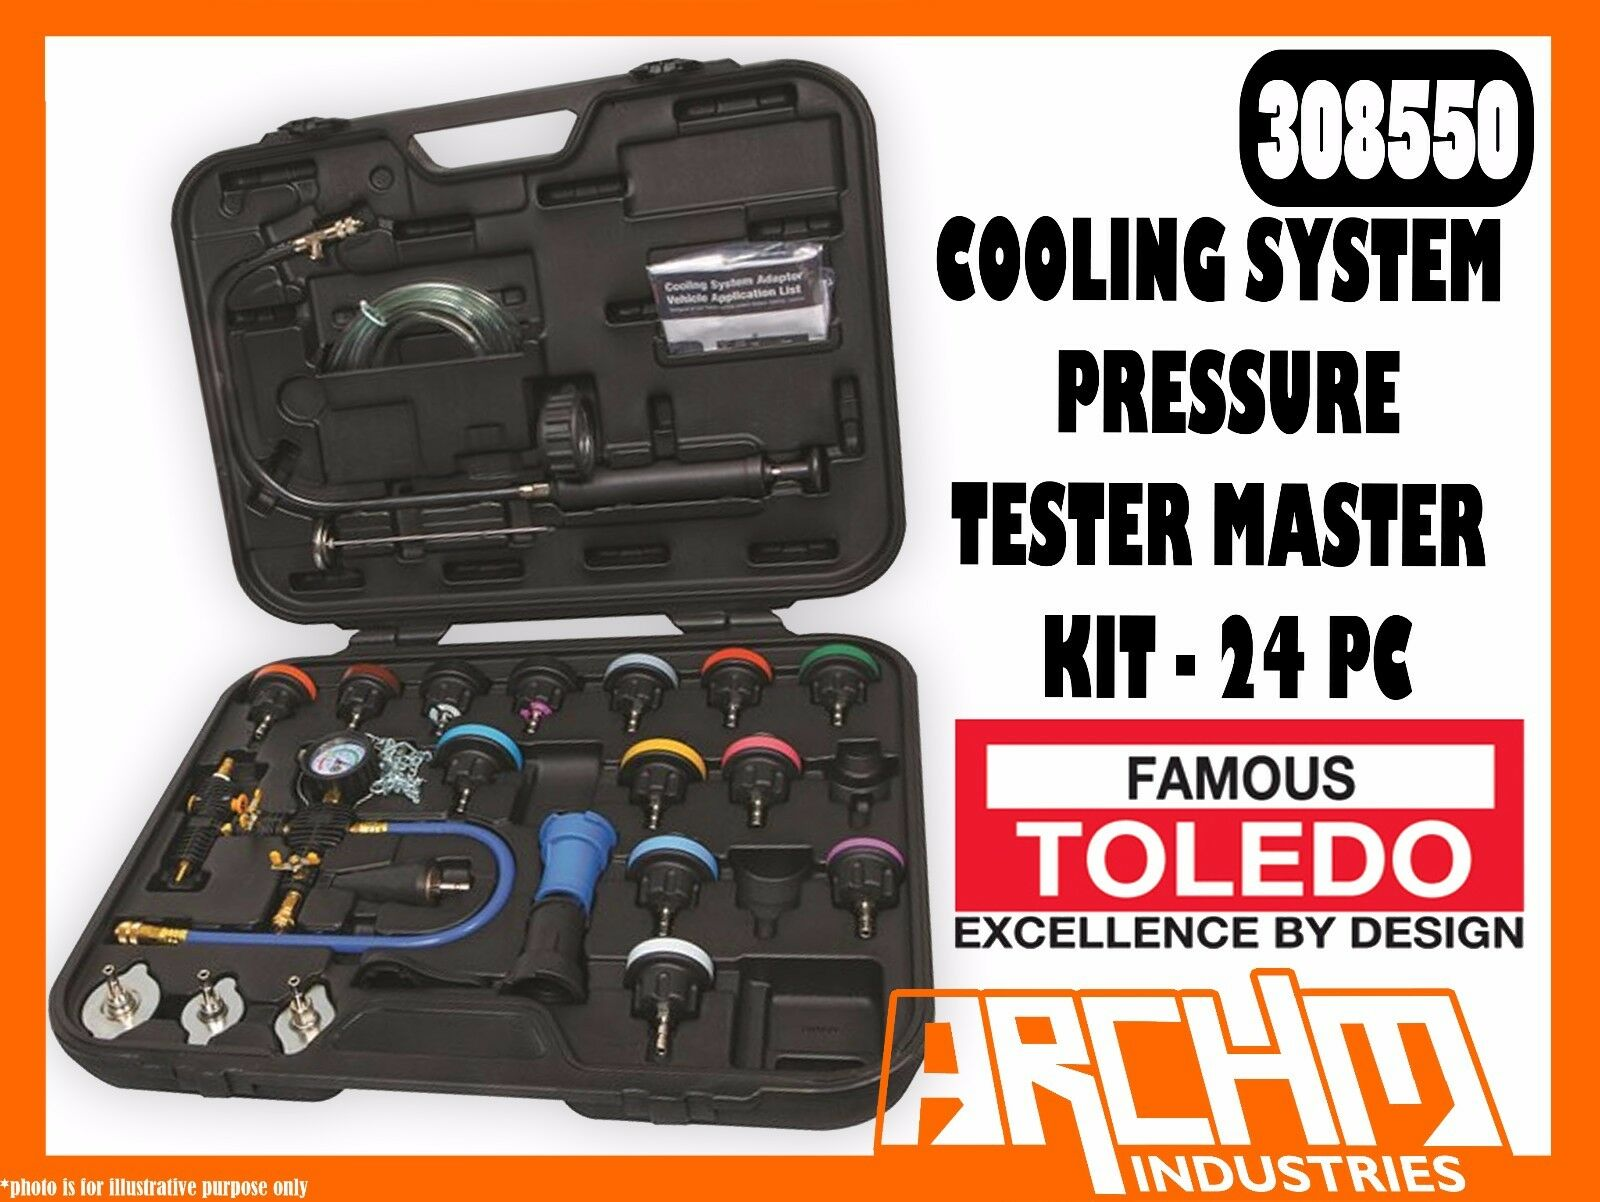 TOLEDO 308550 - COOLING SYSTEM PRESSURE TESTER & VACUUM REFILL MASTER KIT 24 PC